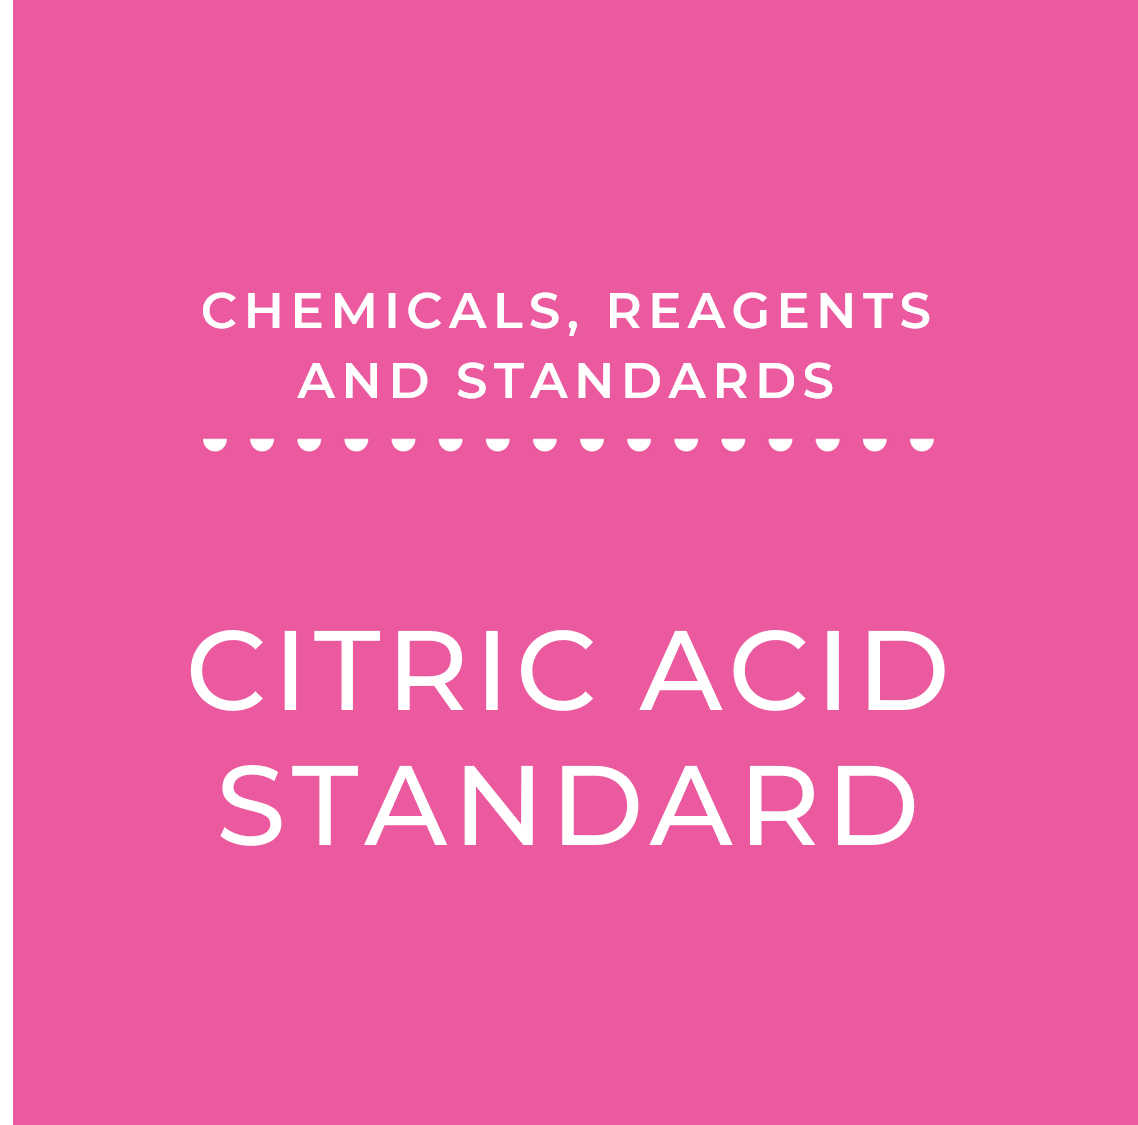 Citric Acid Standard, 200 mg/100 mL